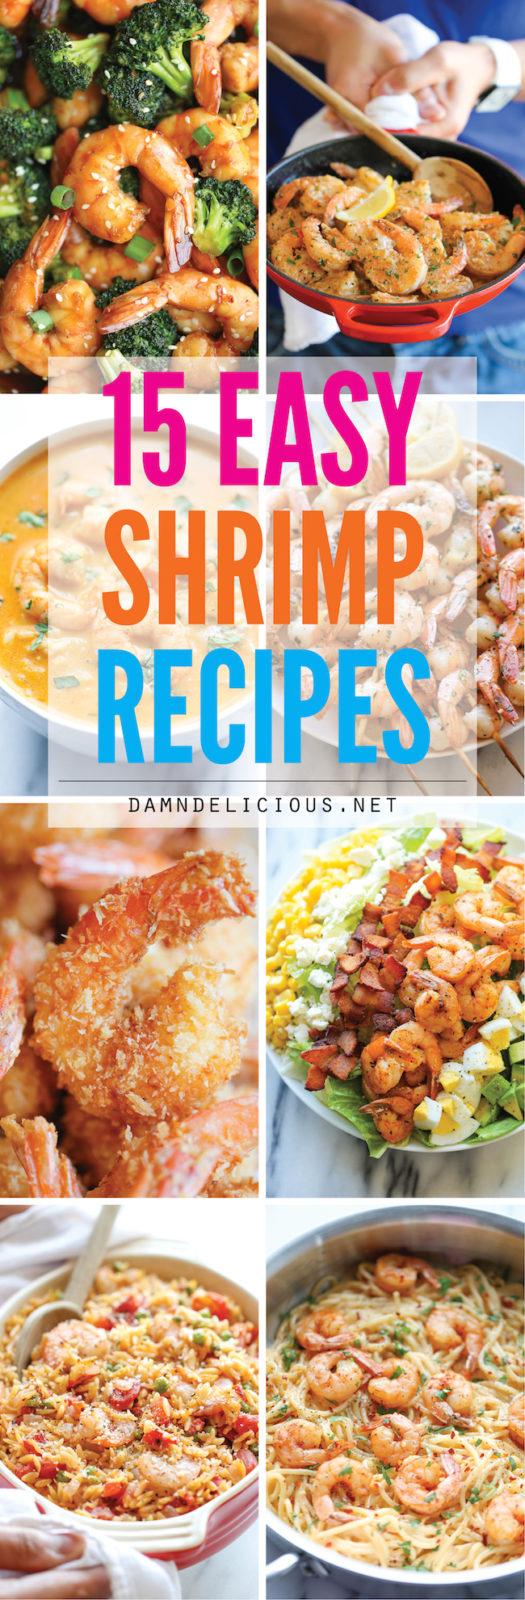 15 Easy Shrimp Recipes - Damn Delicious